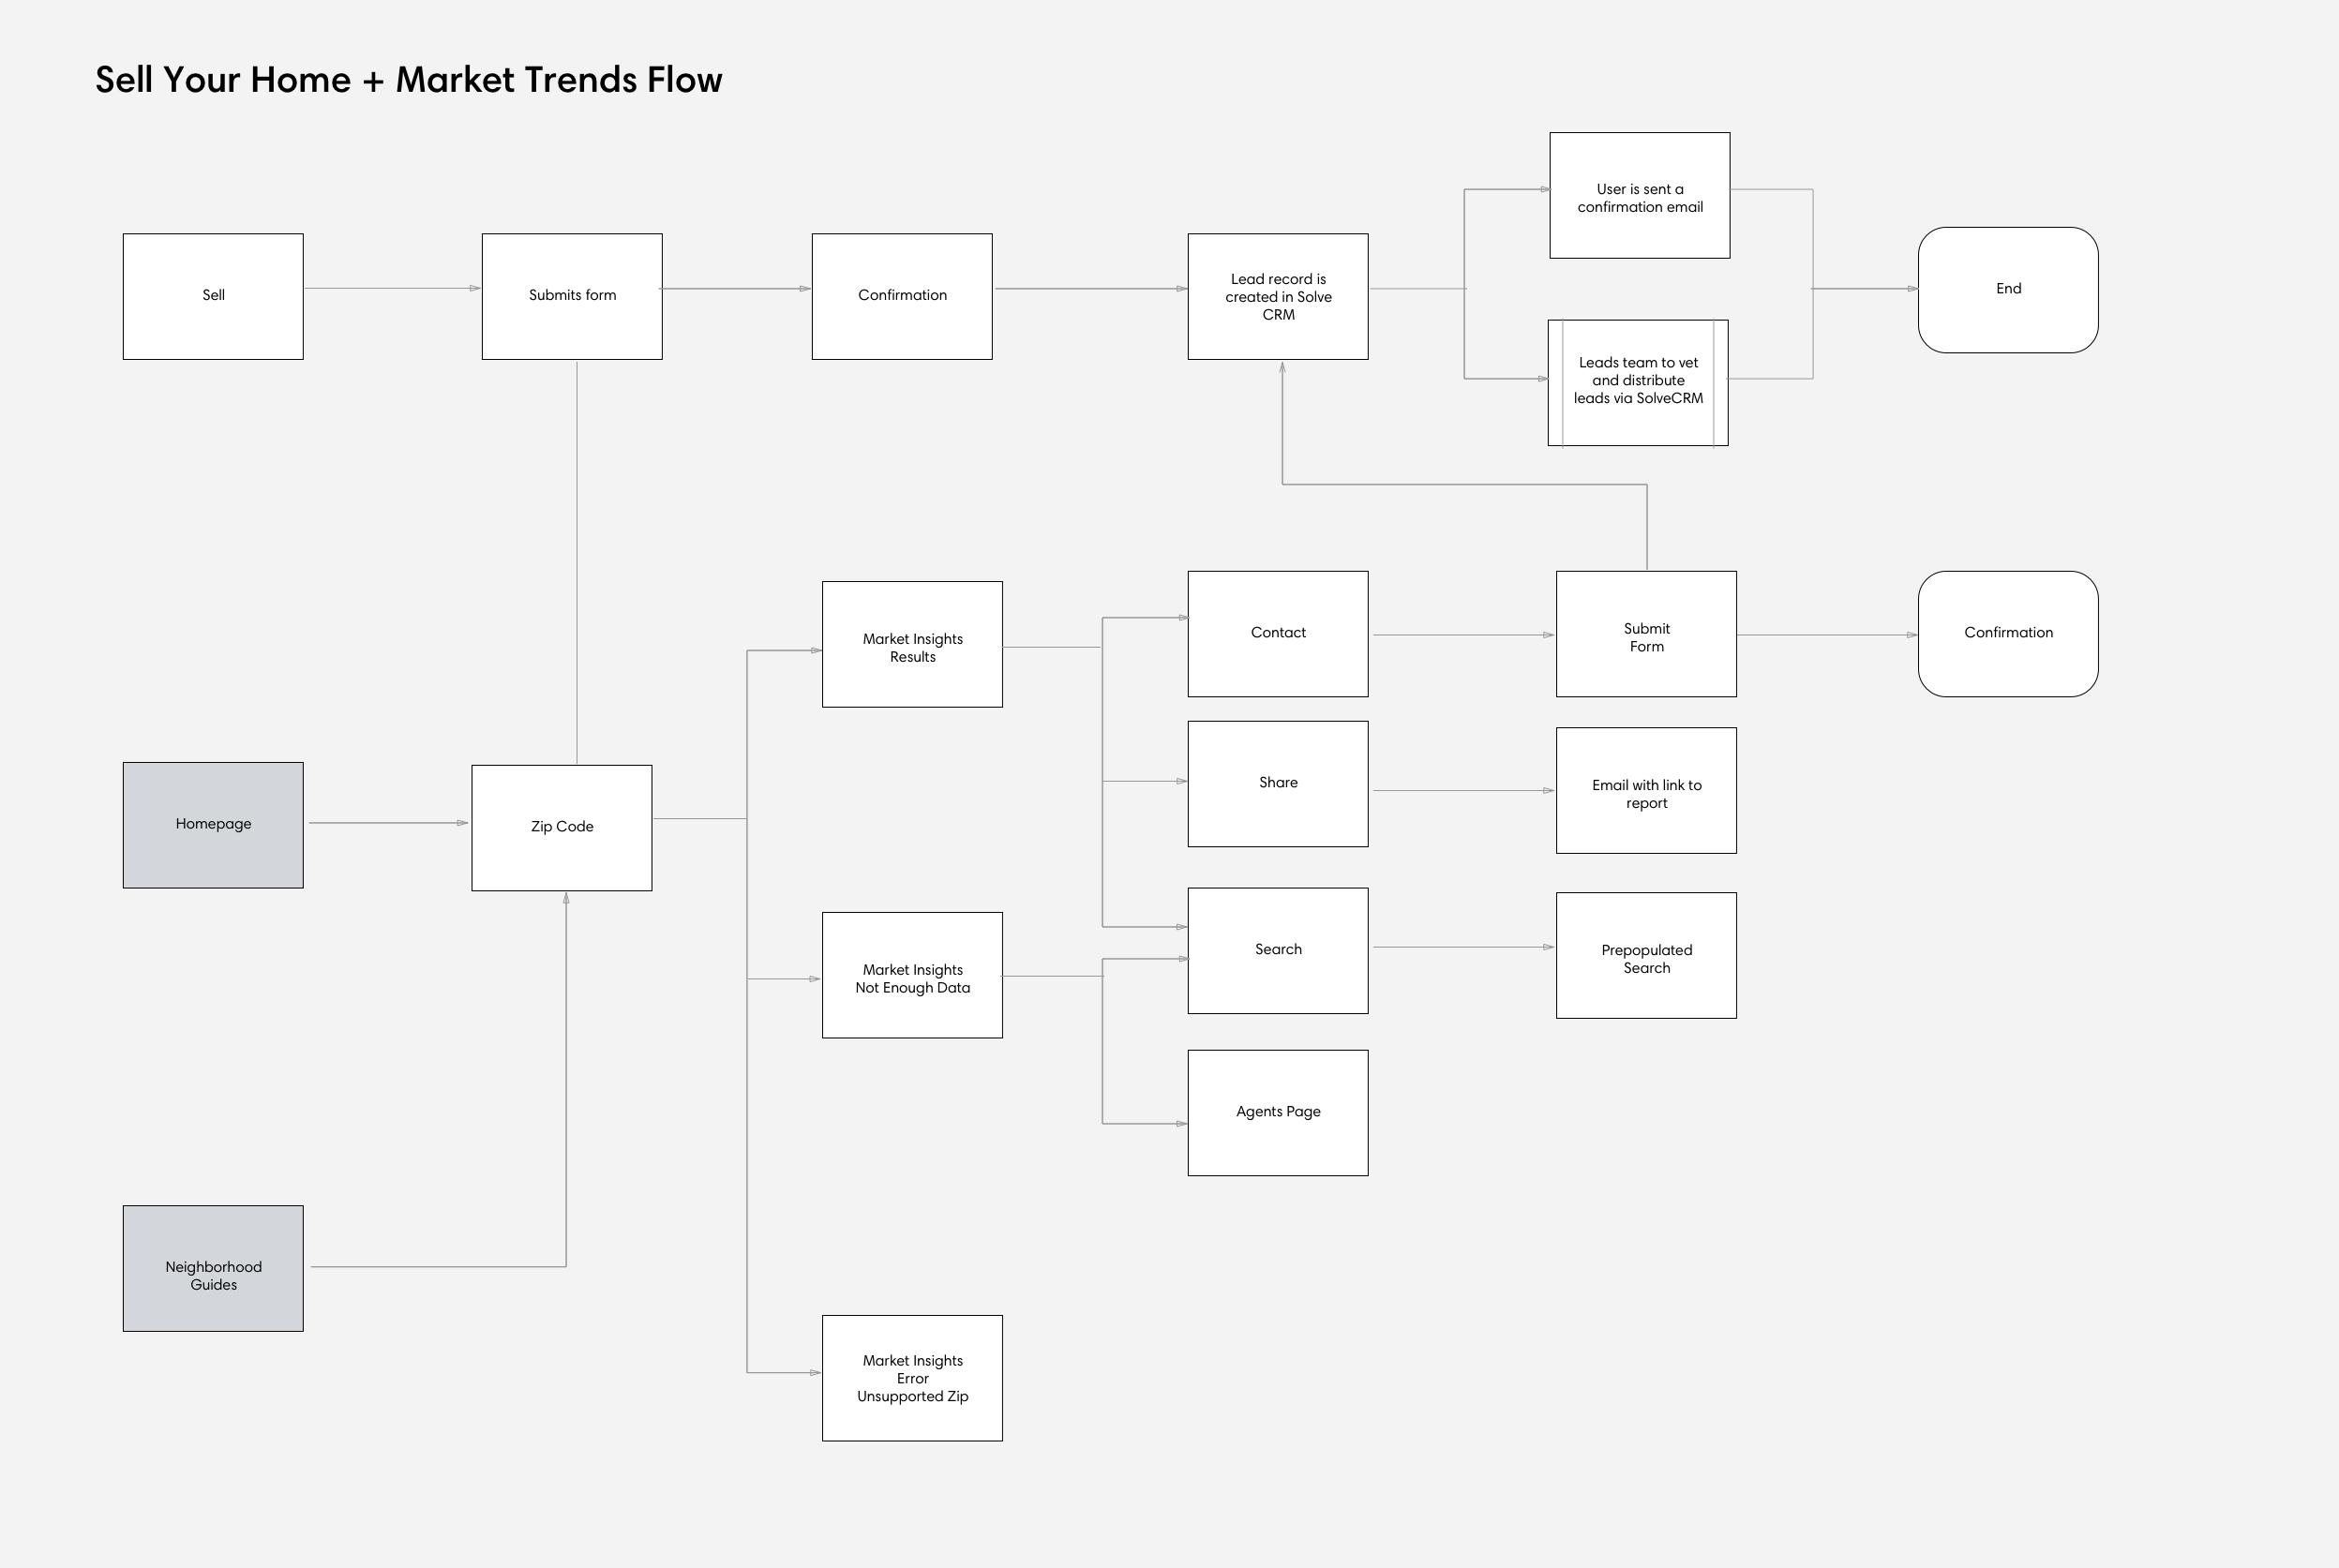 sellermarketinsightsflow